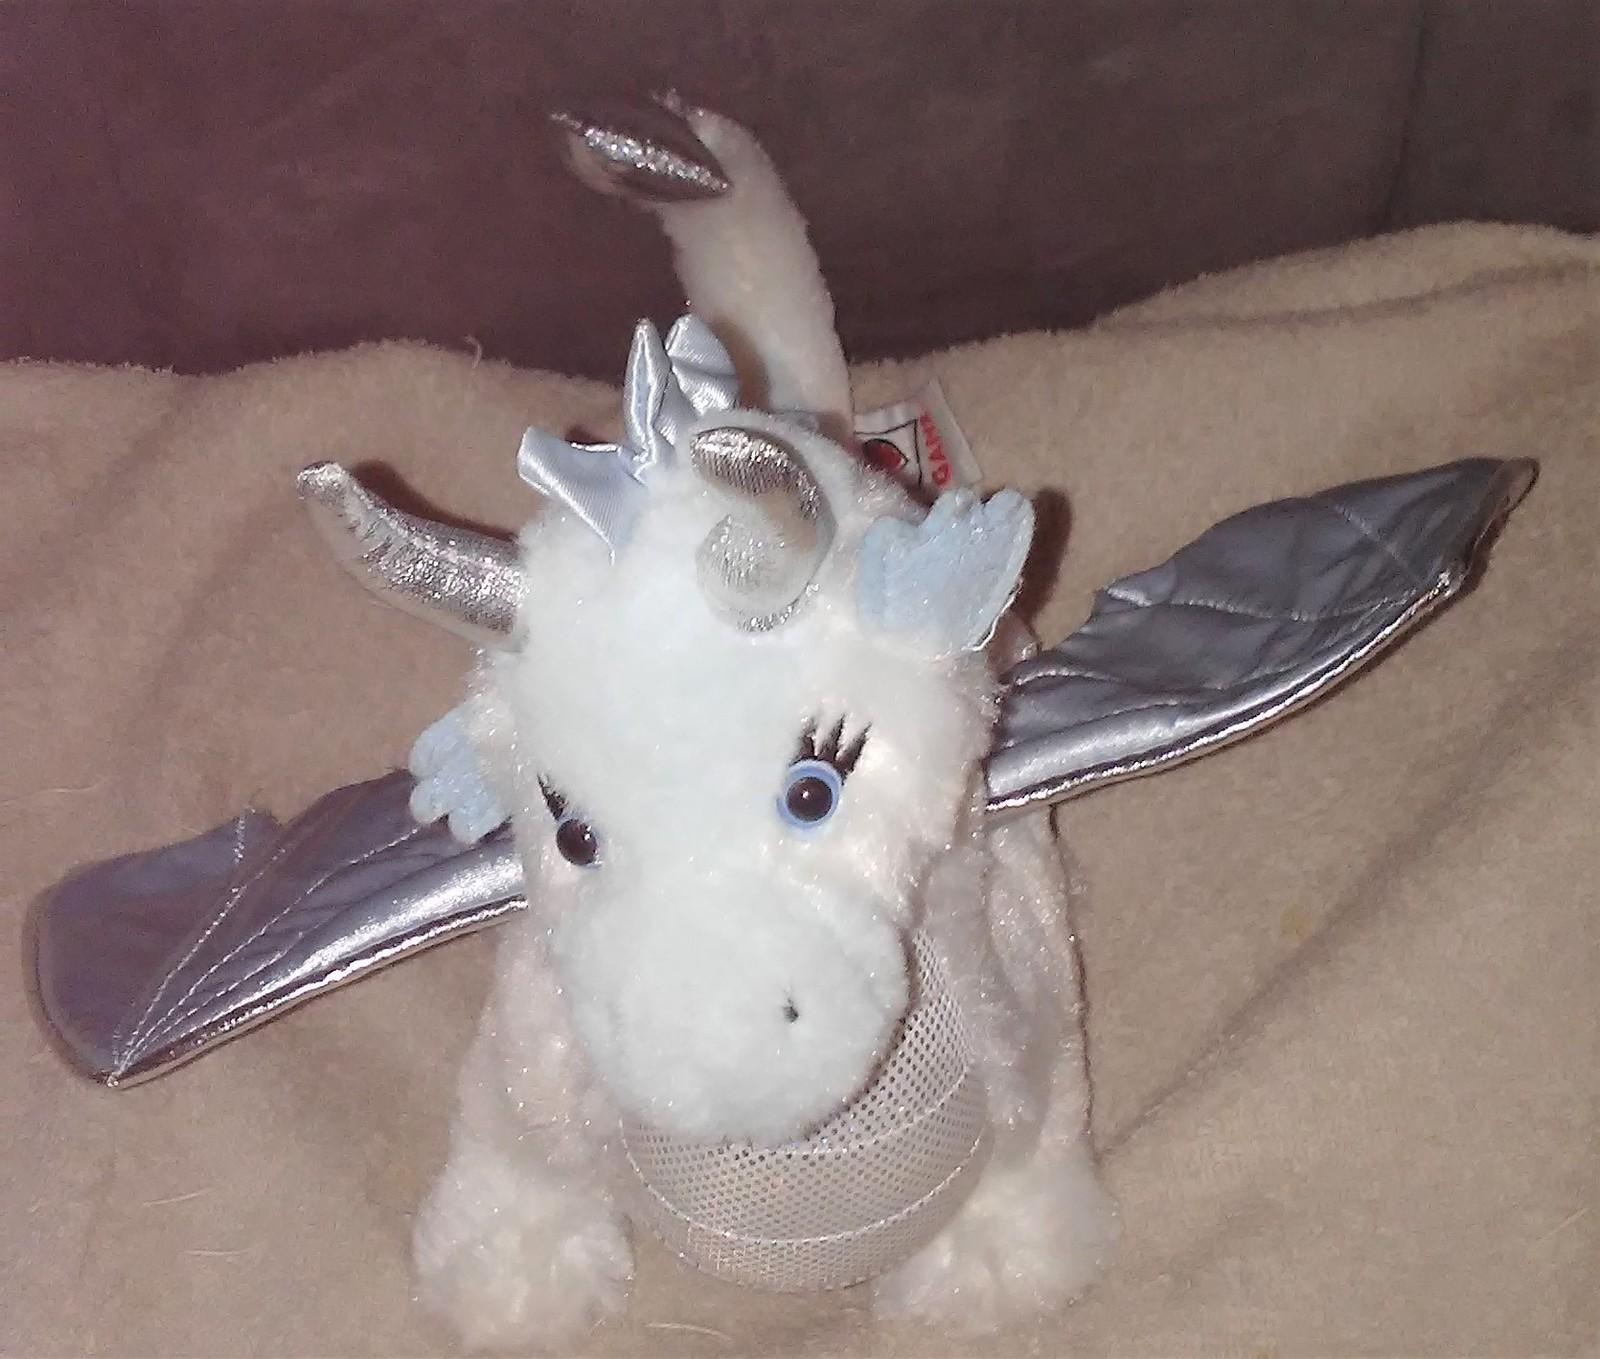 "Webkinz ICE DRAGON Plush by Ganz NO CODE 9"" Tall x 12"" Long"